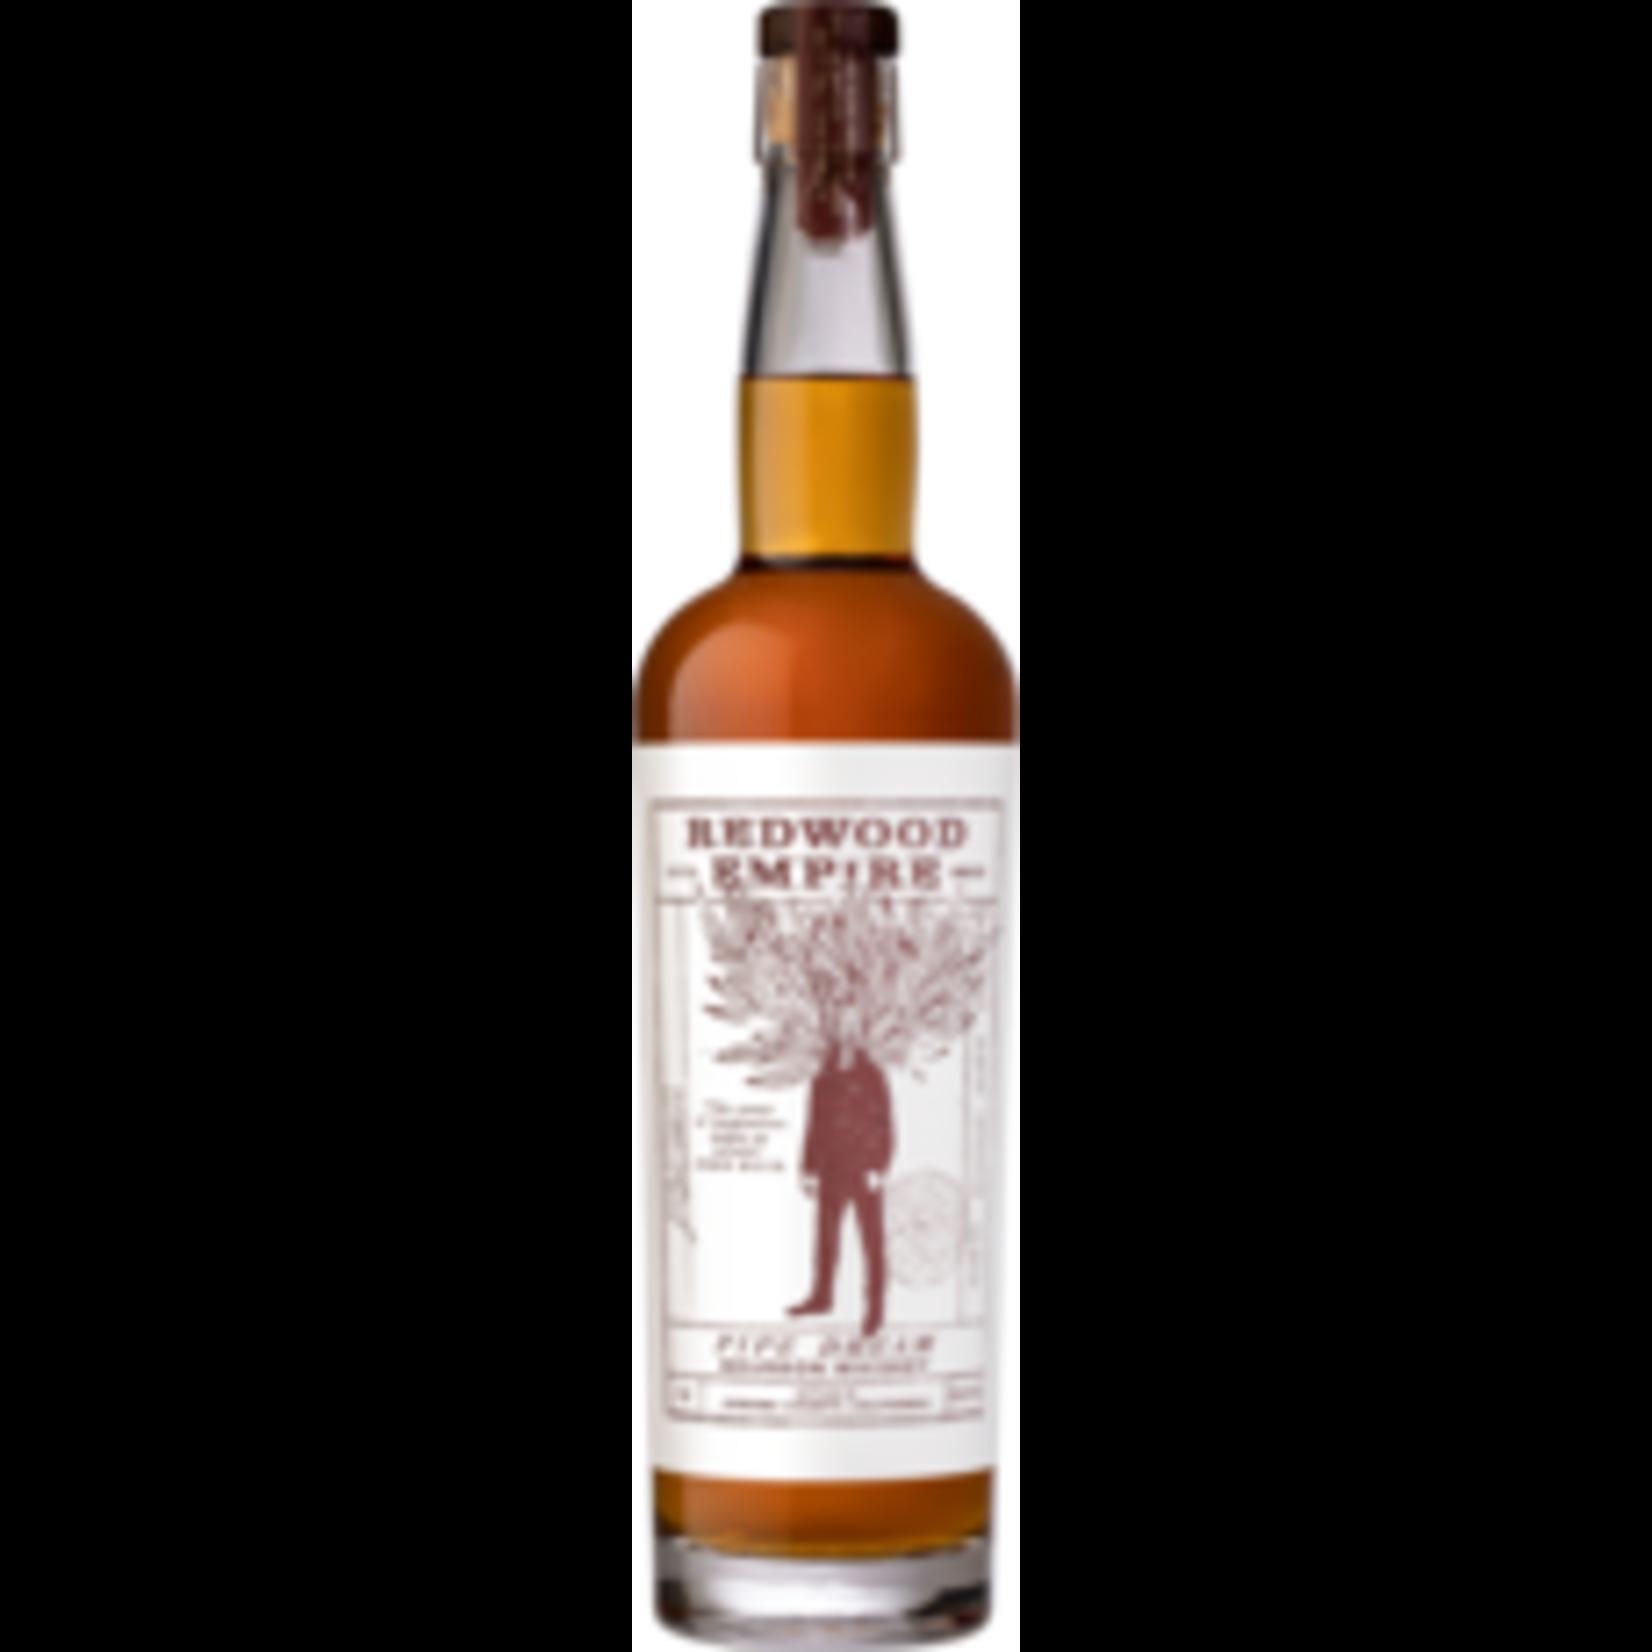 Spirits Redwood Empire Pipe Dream Bourbon Sonoma County